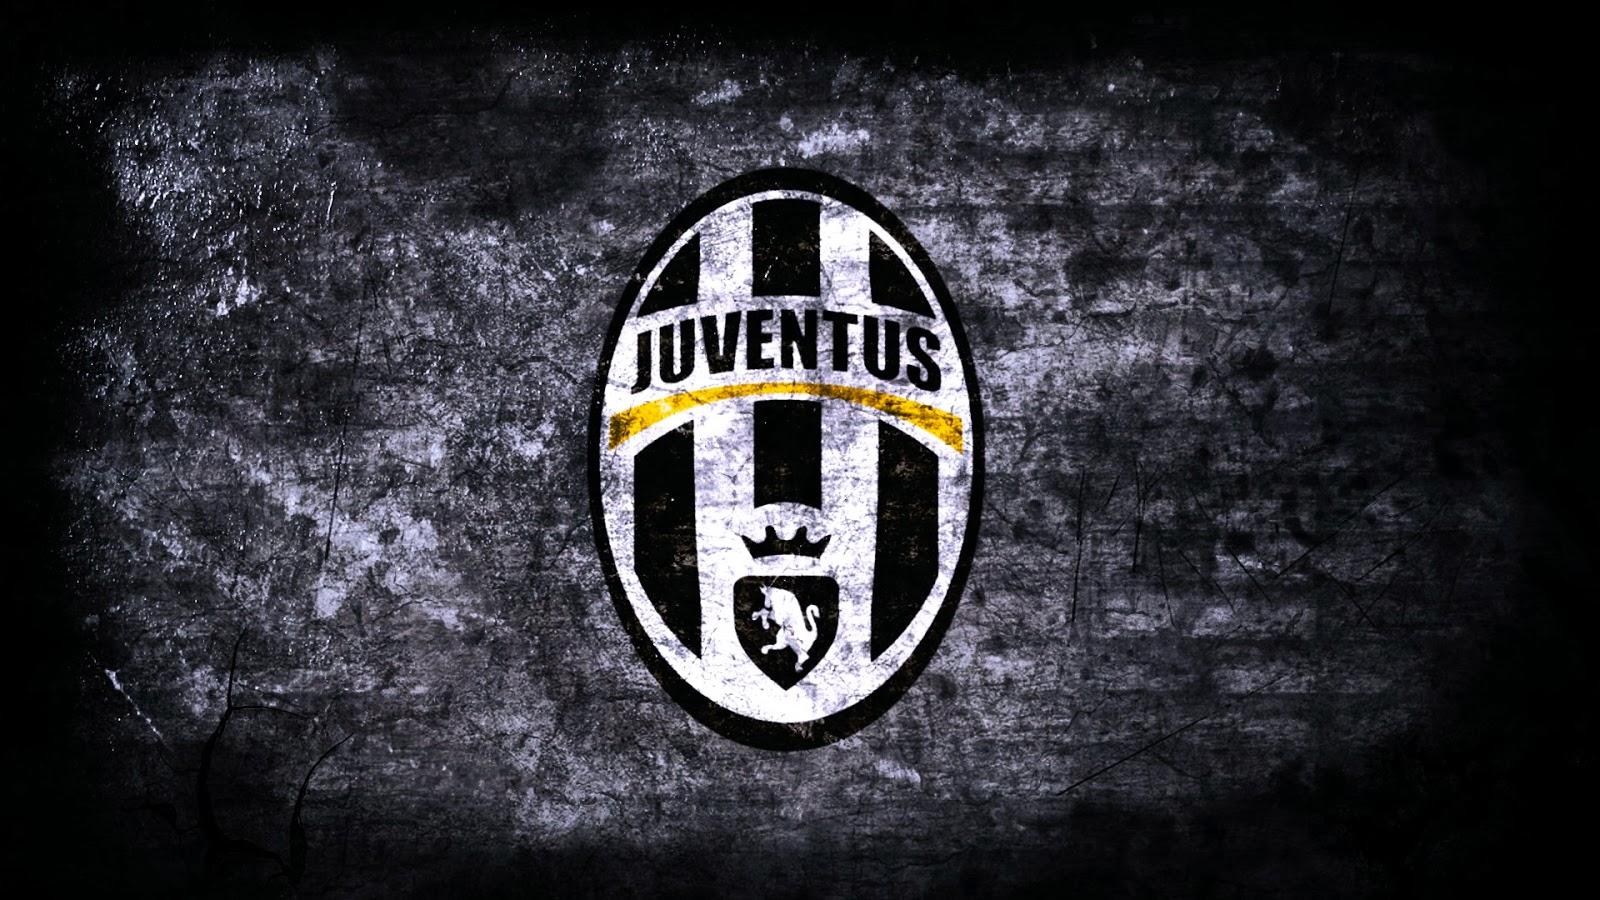 Football Clubs: Football Club Logo HD Wallpapers 2014-2015